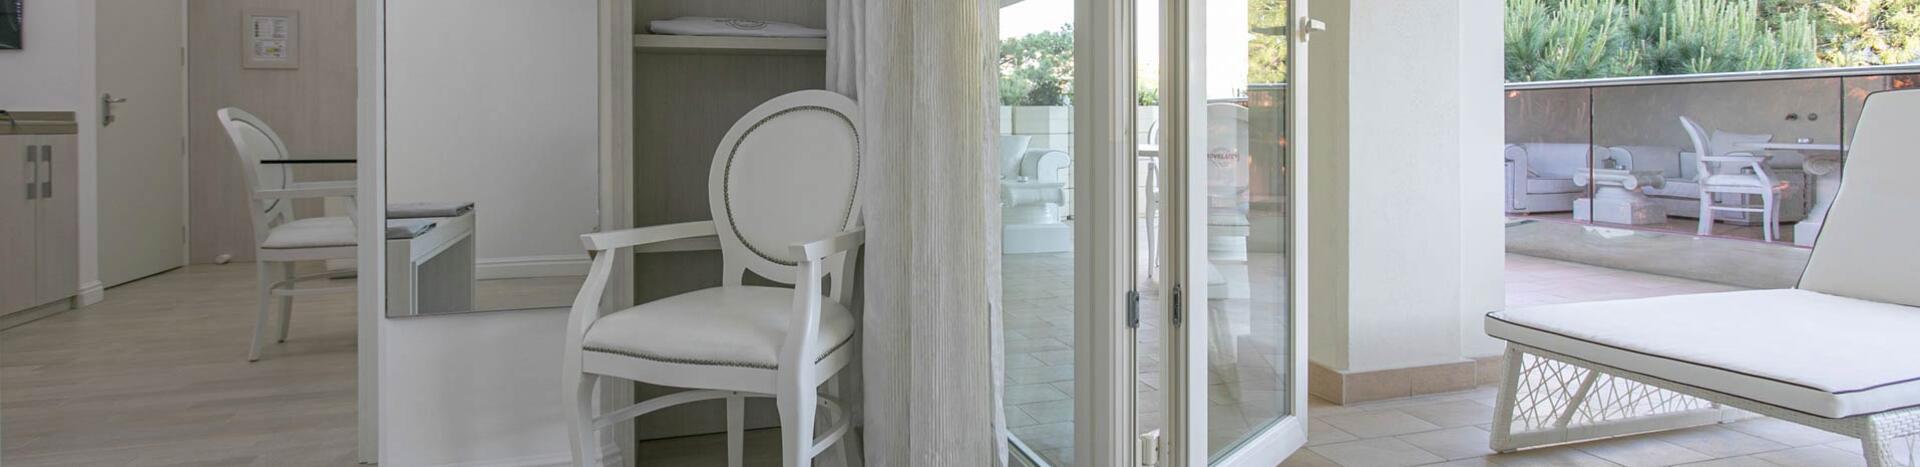 hotelparadisomilanomarittima en purify-rooms 001